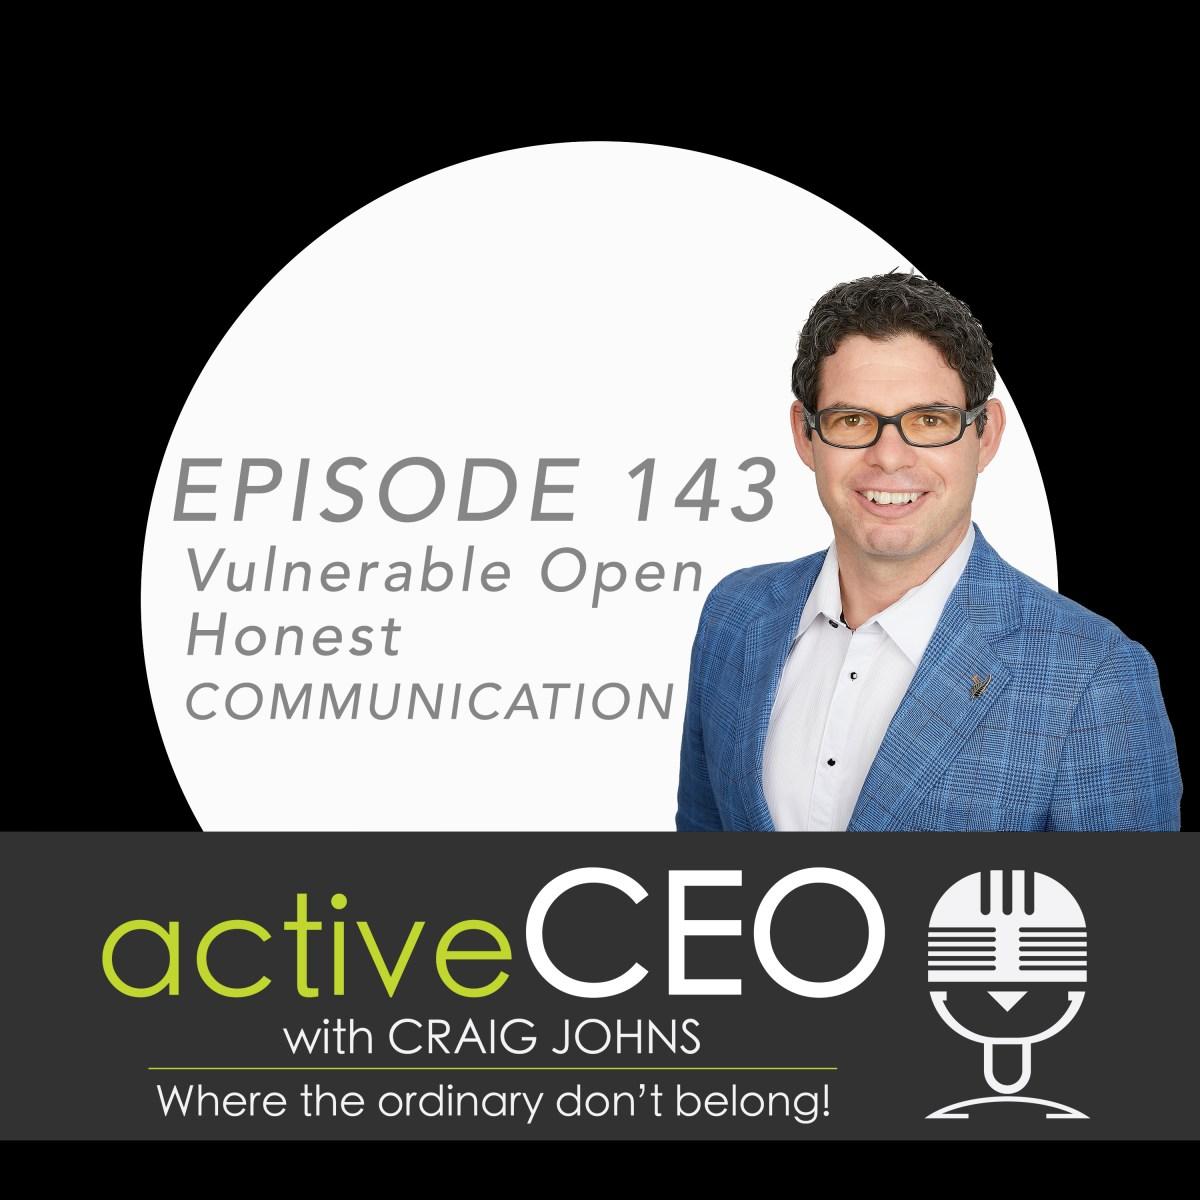 active CEO Podcast 143 Vulnerable Open Honest Communication